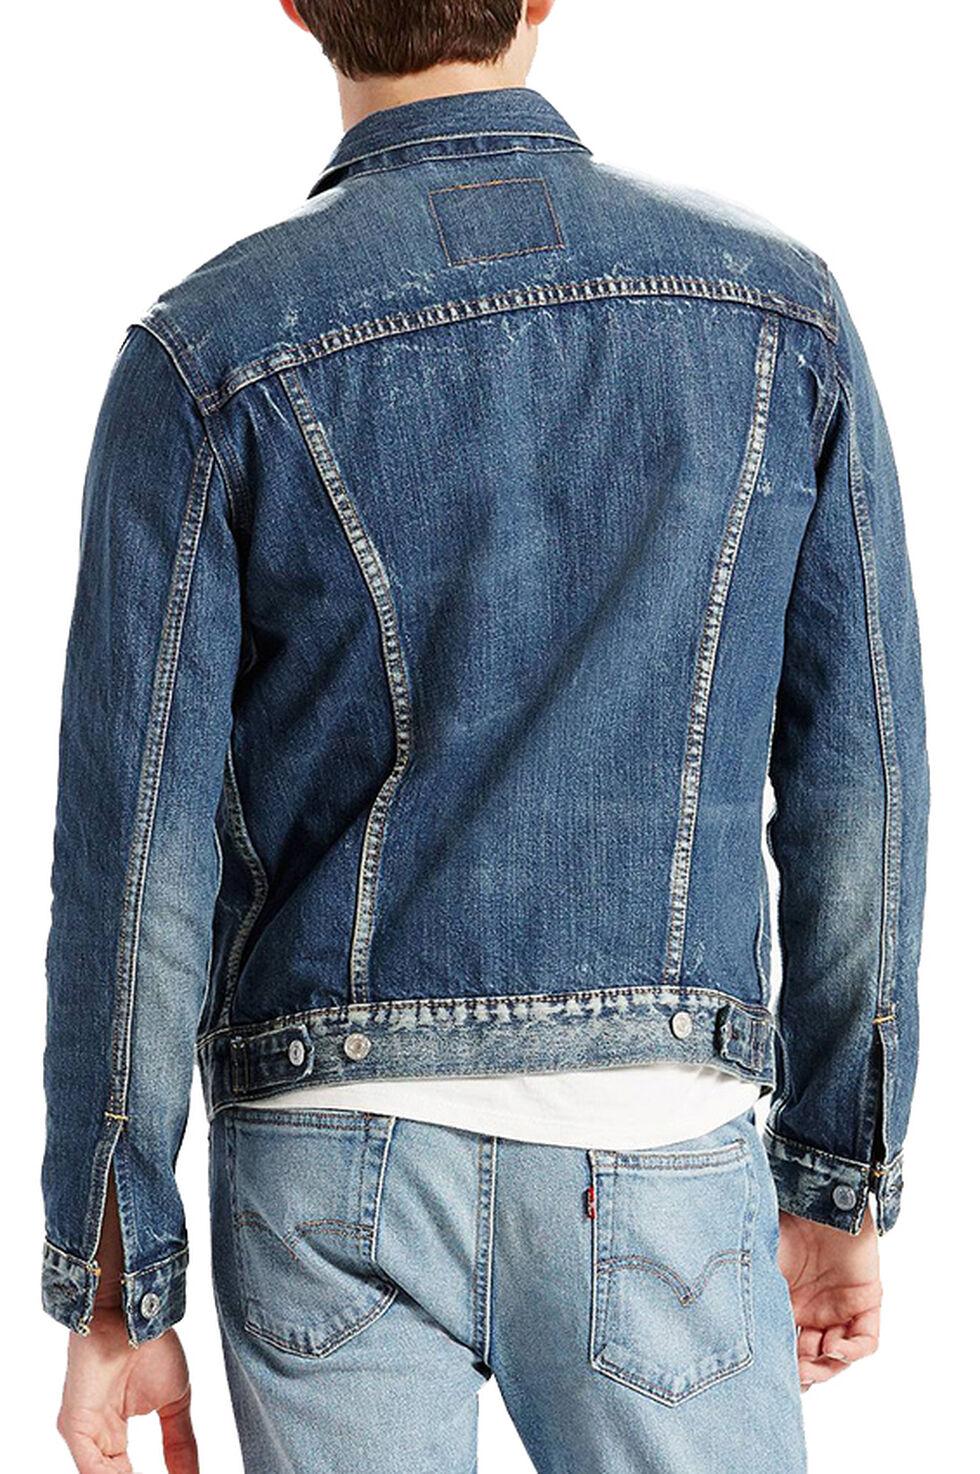 Levi's Men's Denim Trucker Jacket, Denim, hi-res